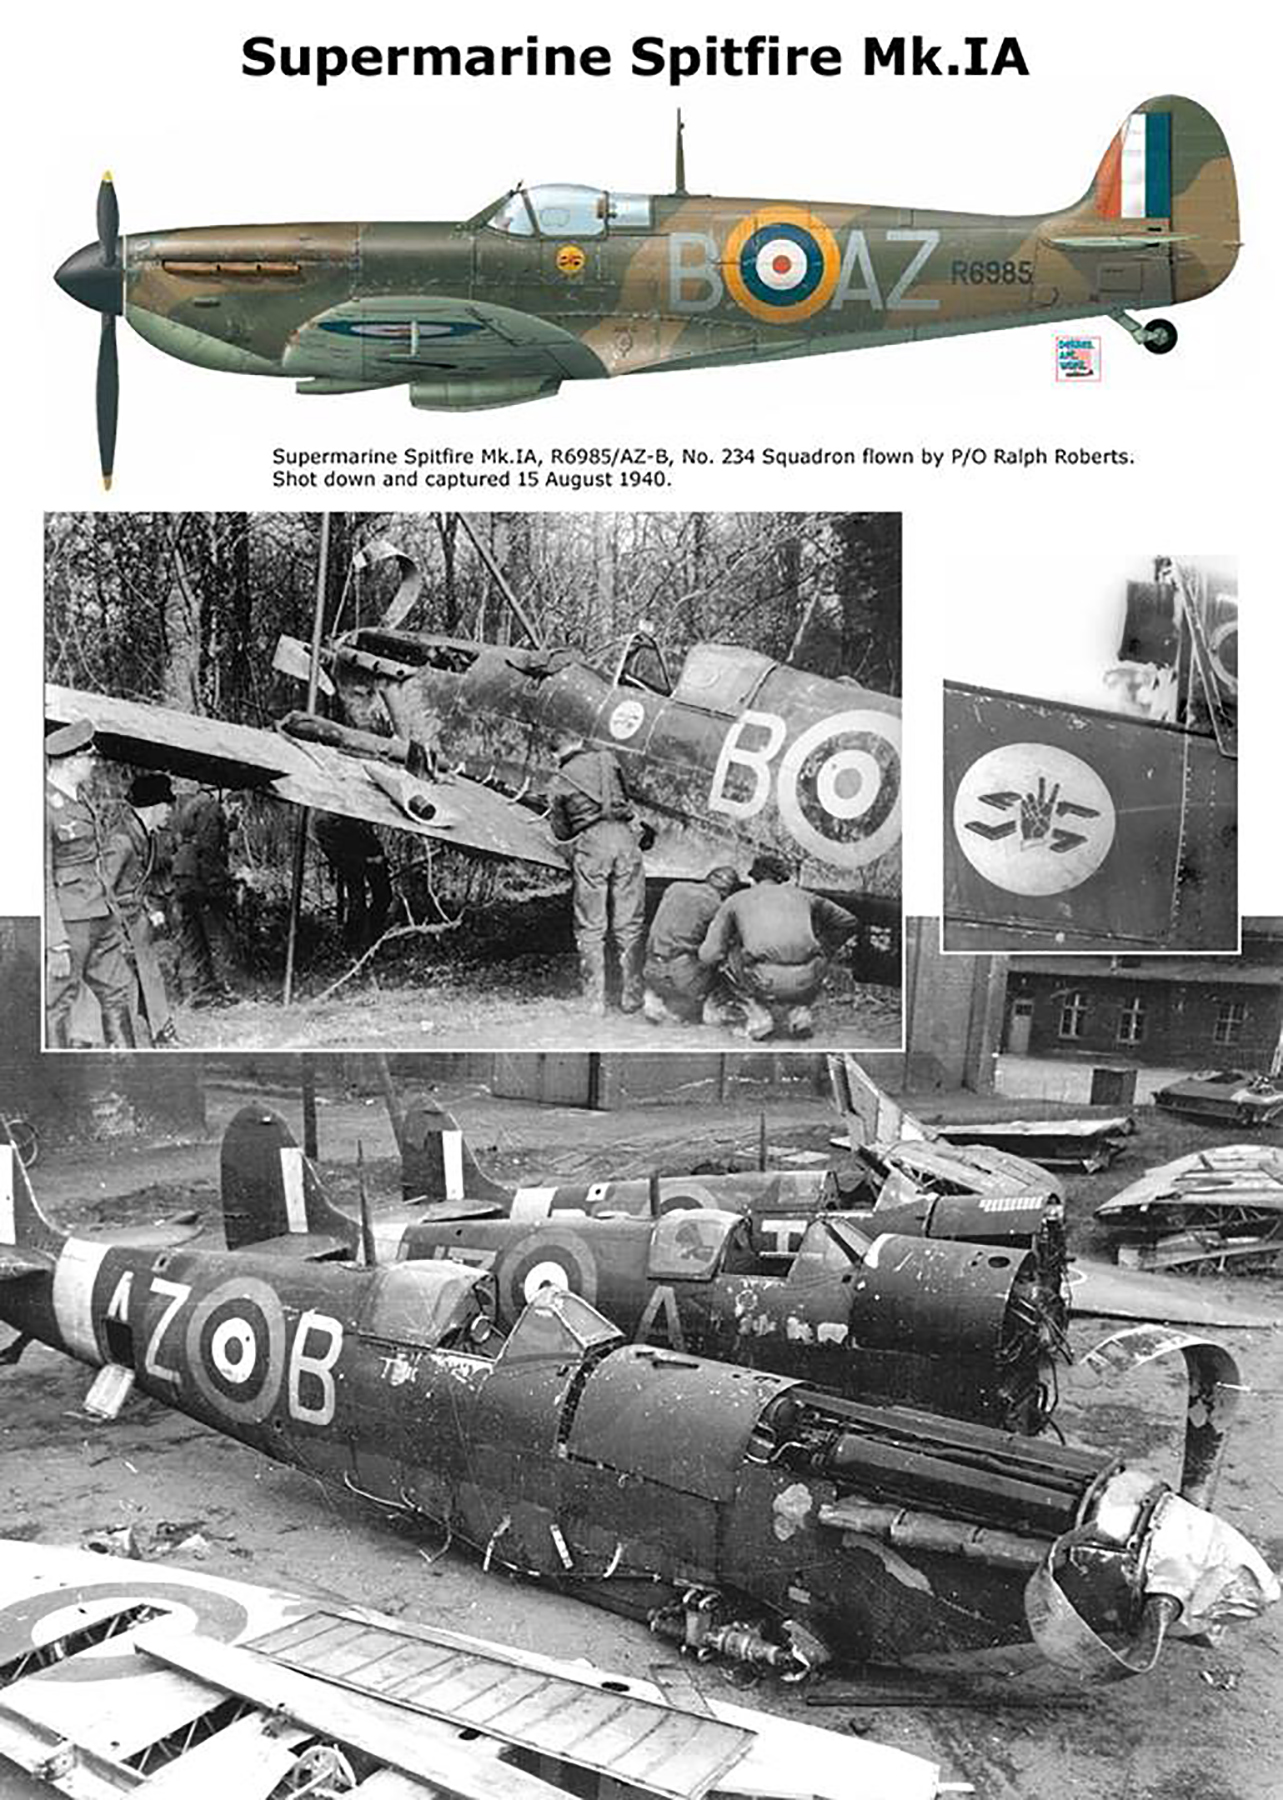 Spitfire MkIa RAF 234Sqn AZB Ralph Roberts R6985 Cherbourg France Aug 15 1940 0A